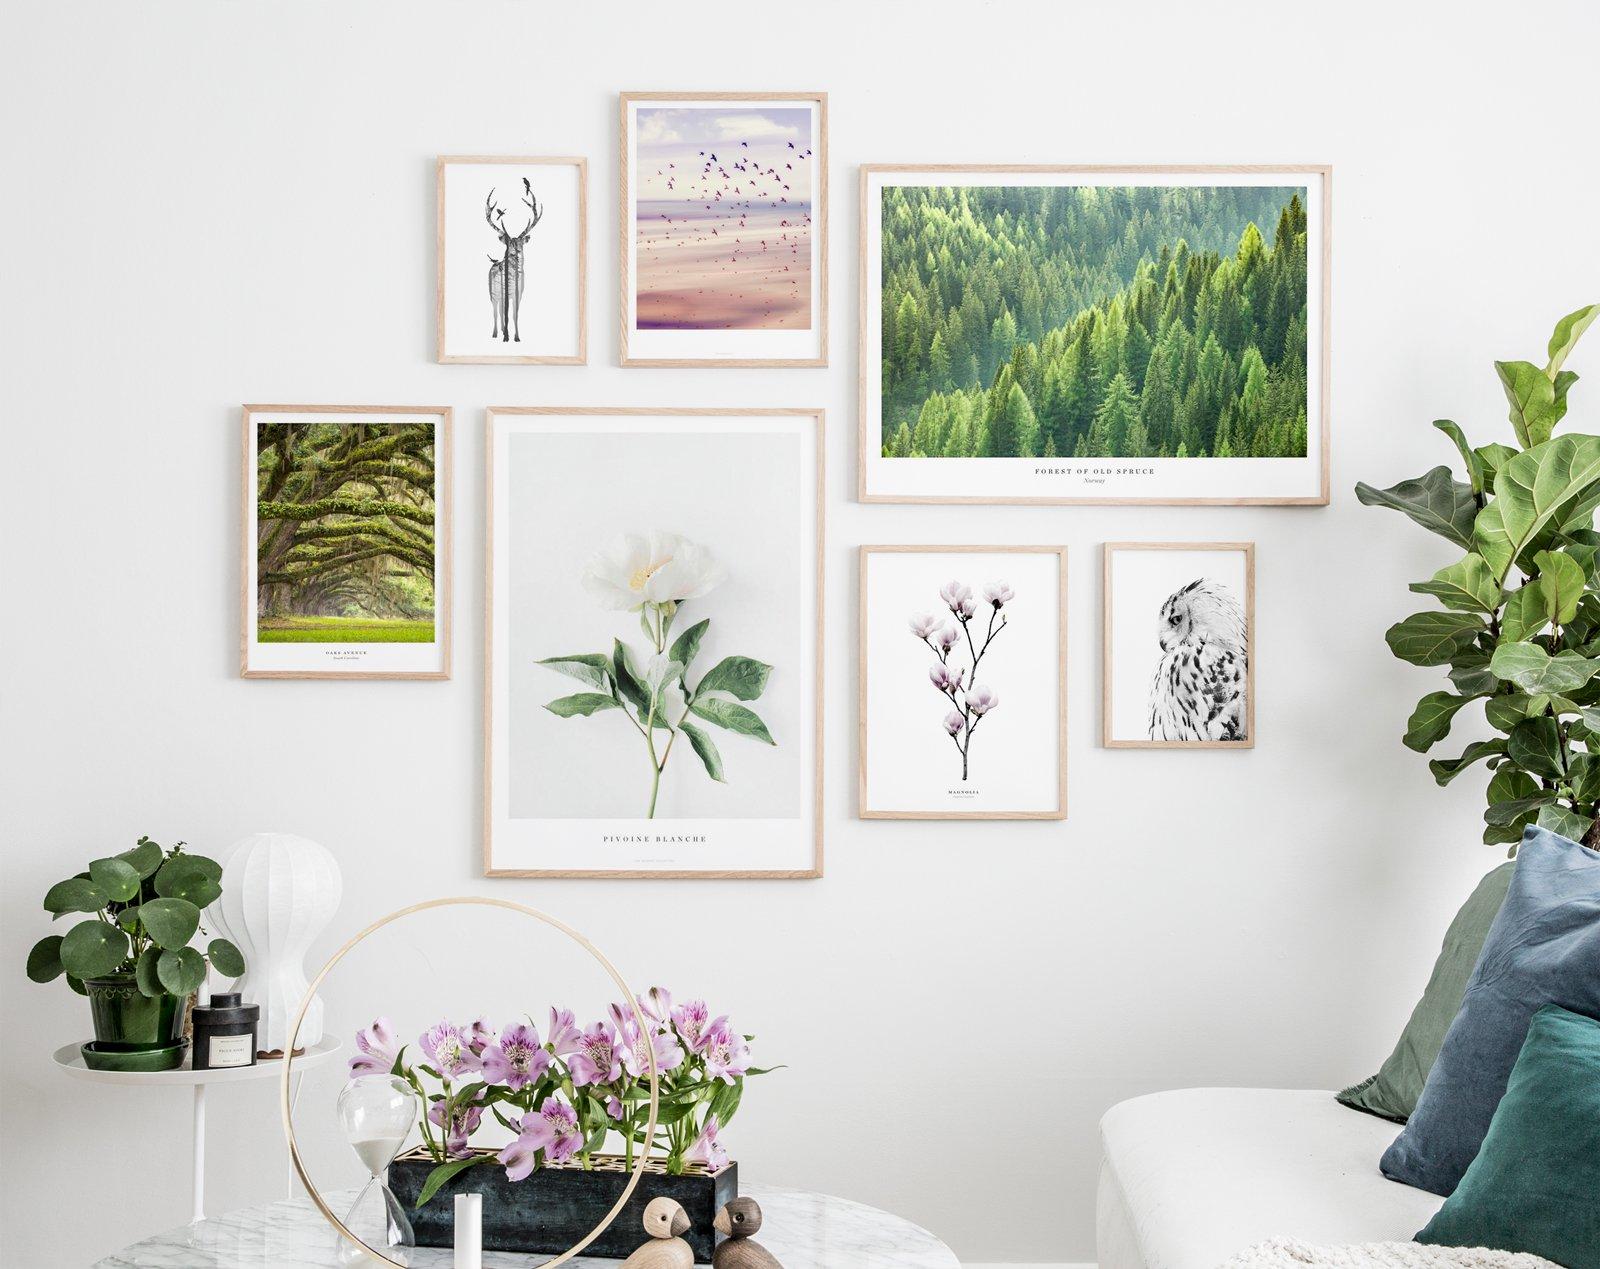 Random gallery wall